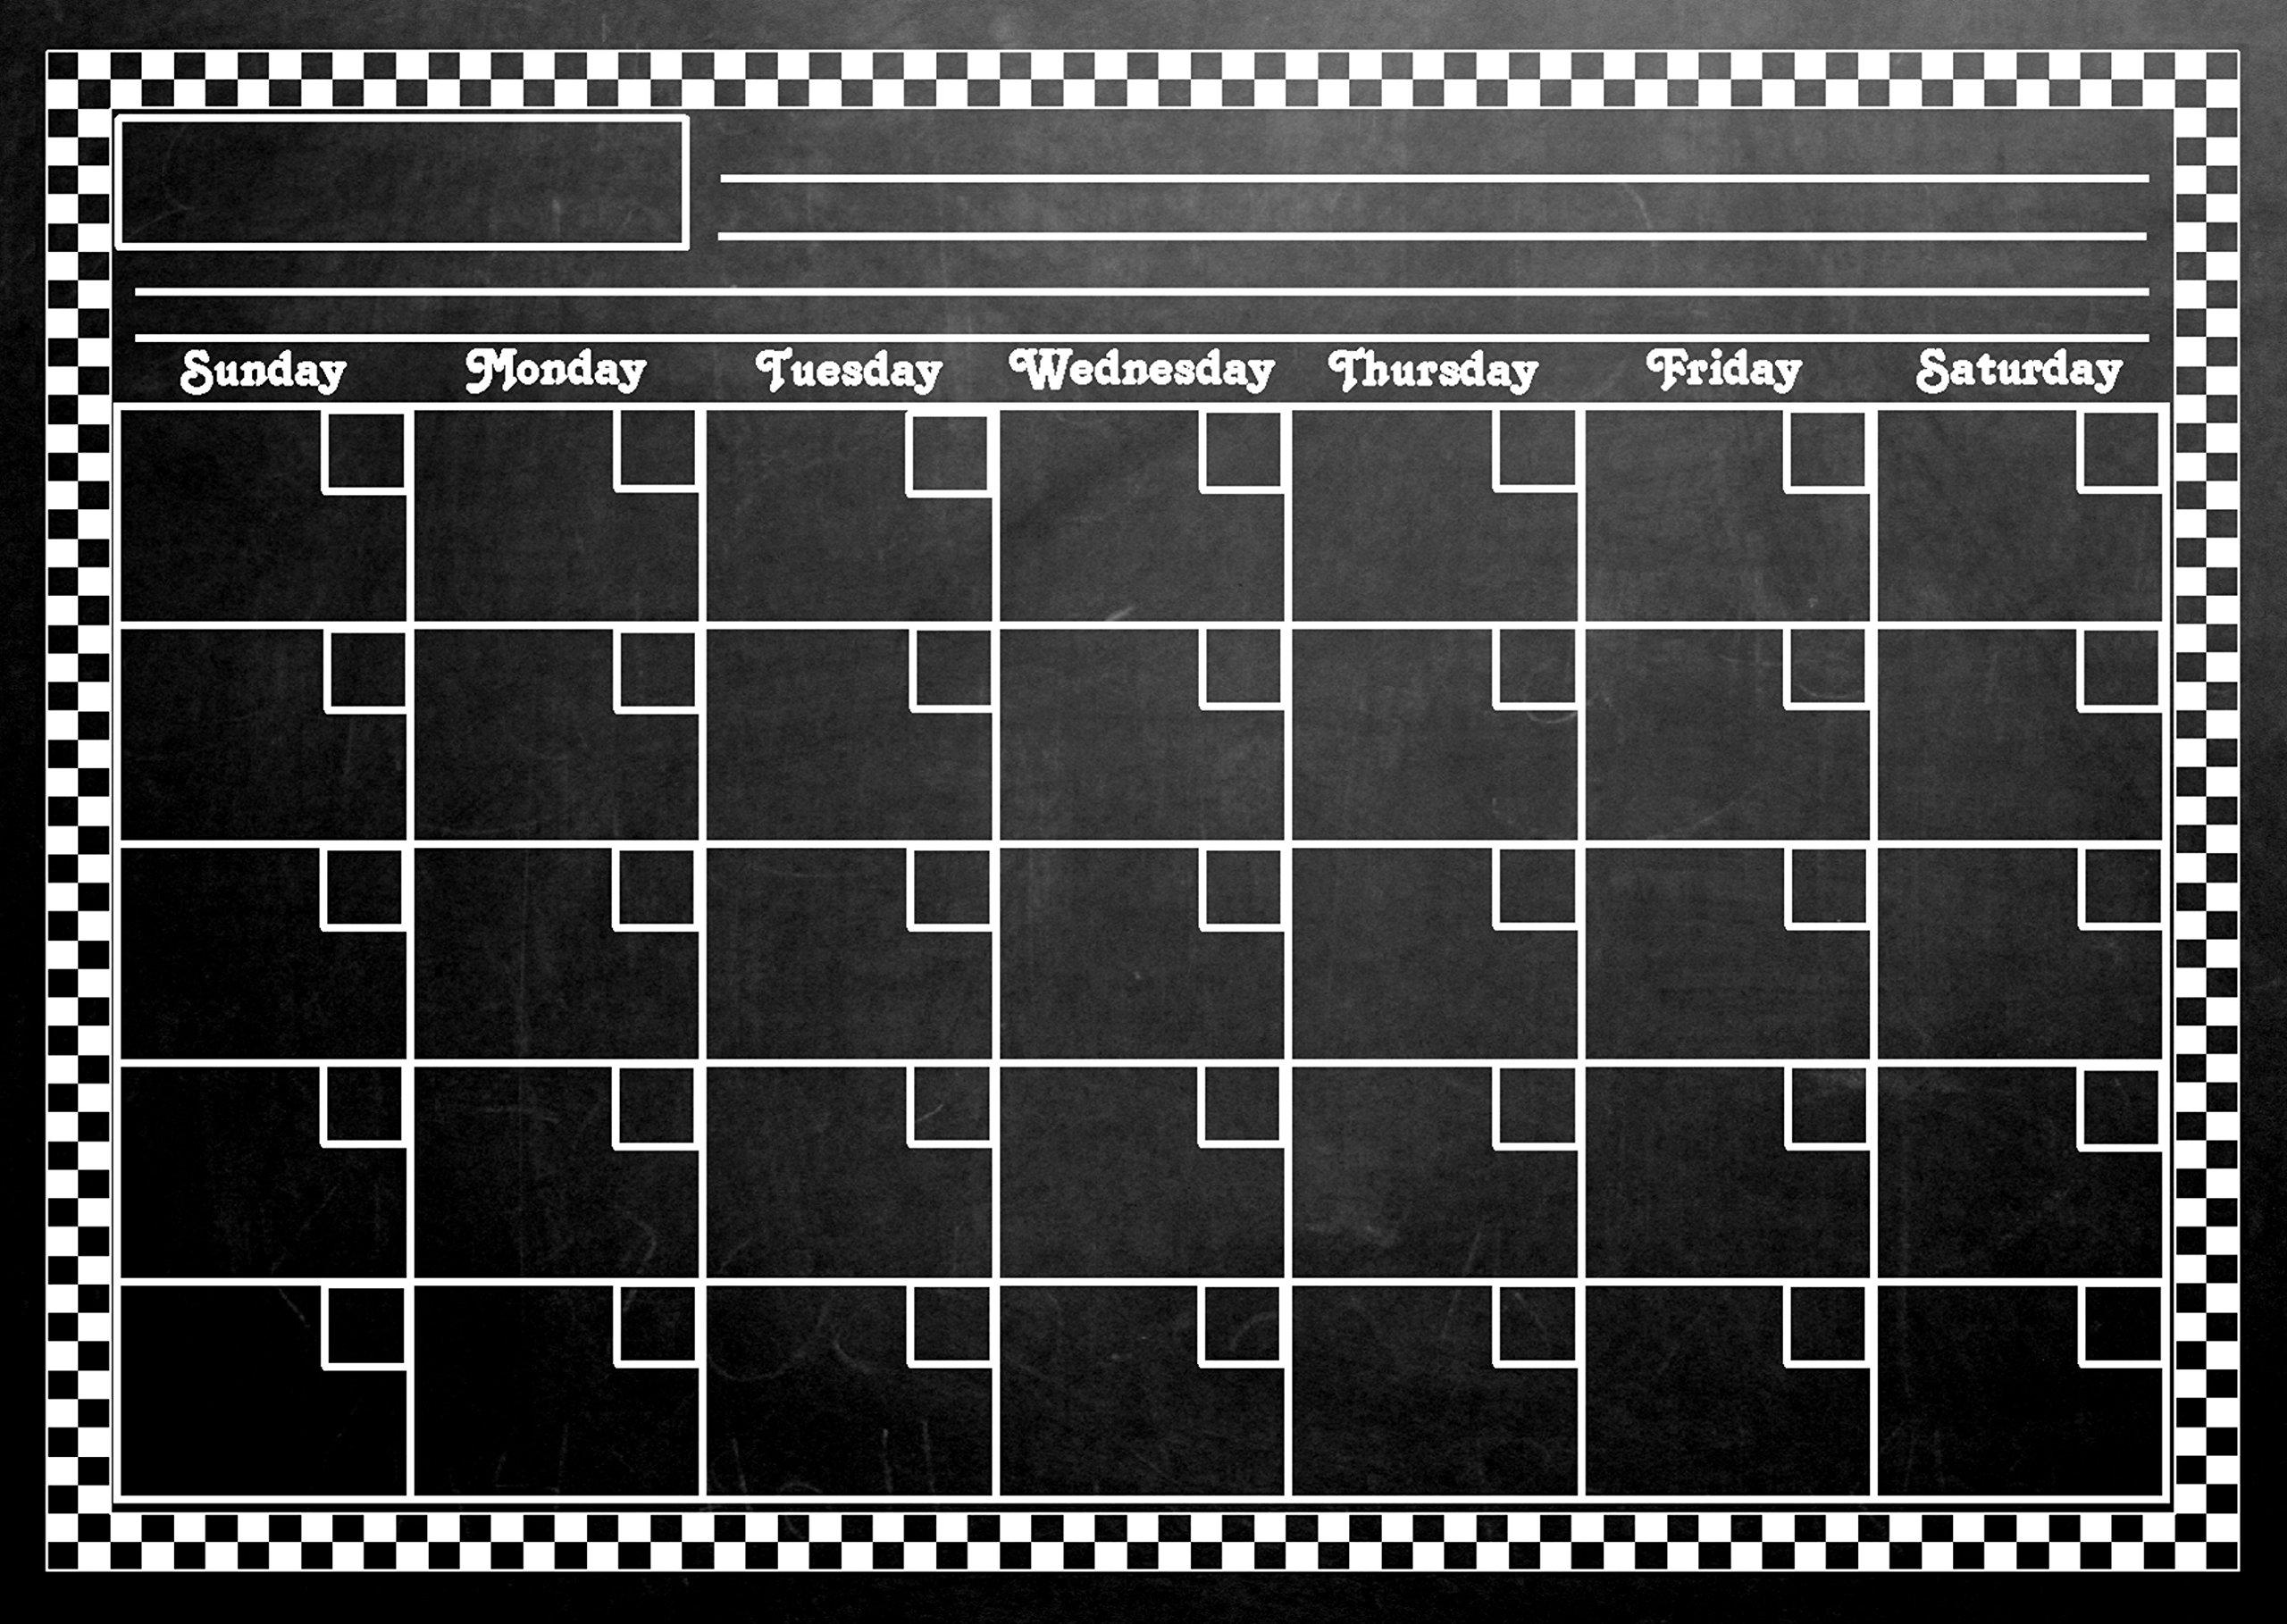 LARGE 12'' X 17'' Magnetic Refrigerator Chalkboard Dry Erase Calendar (dusty black chalkboard design)